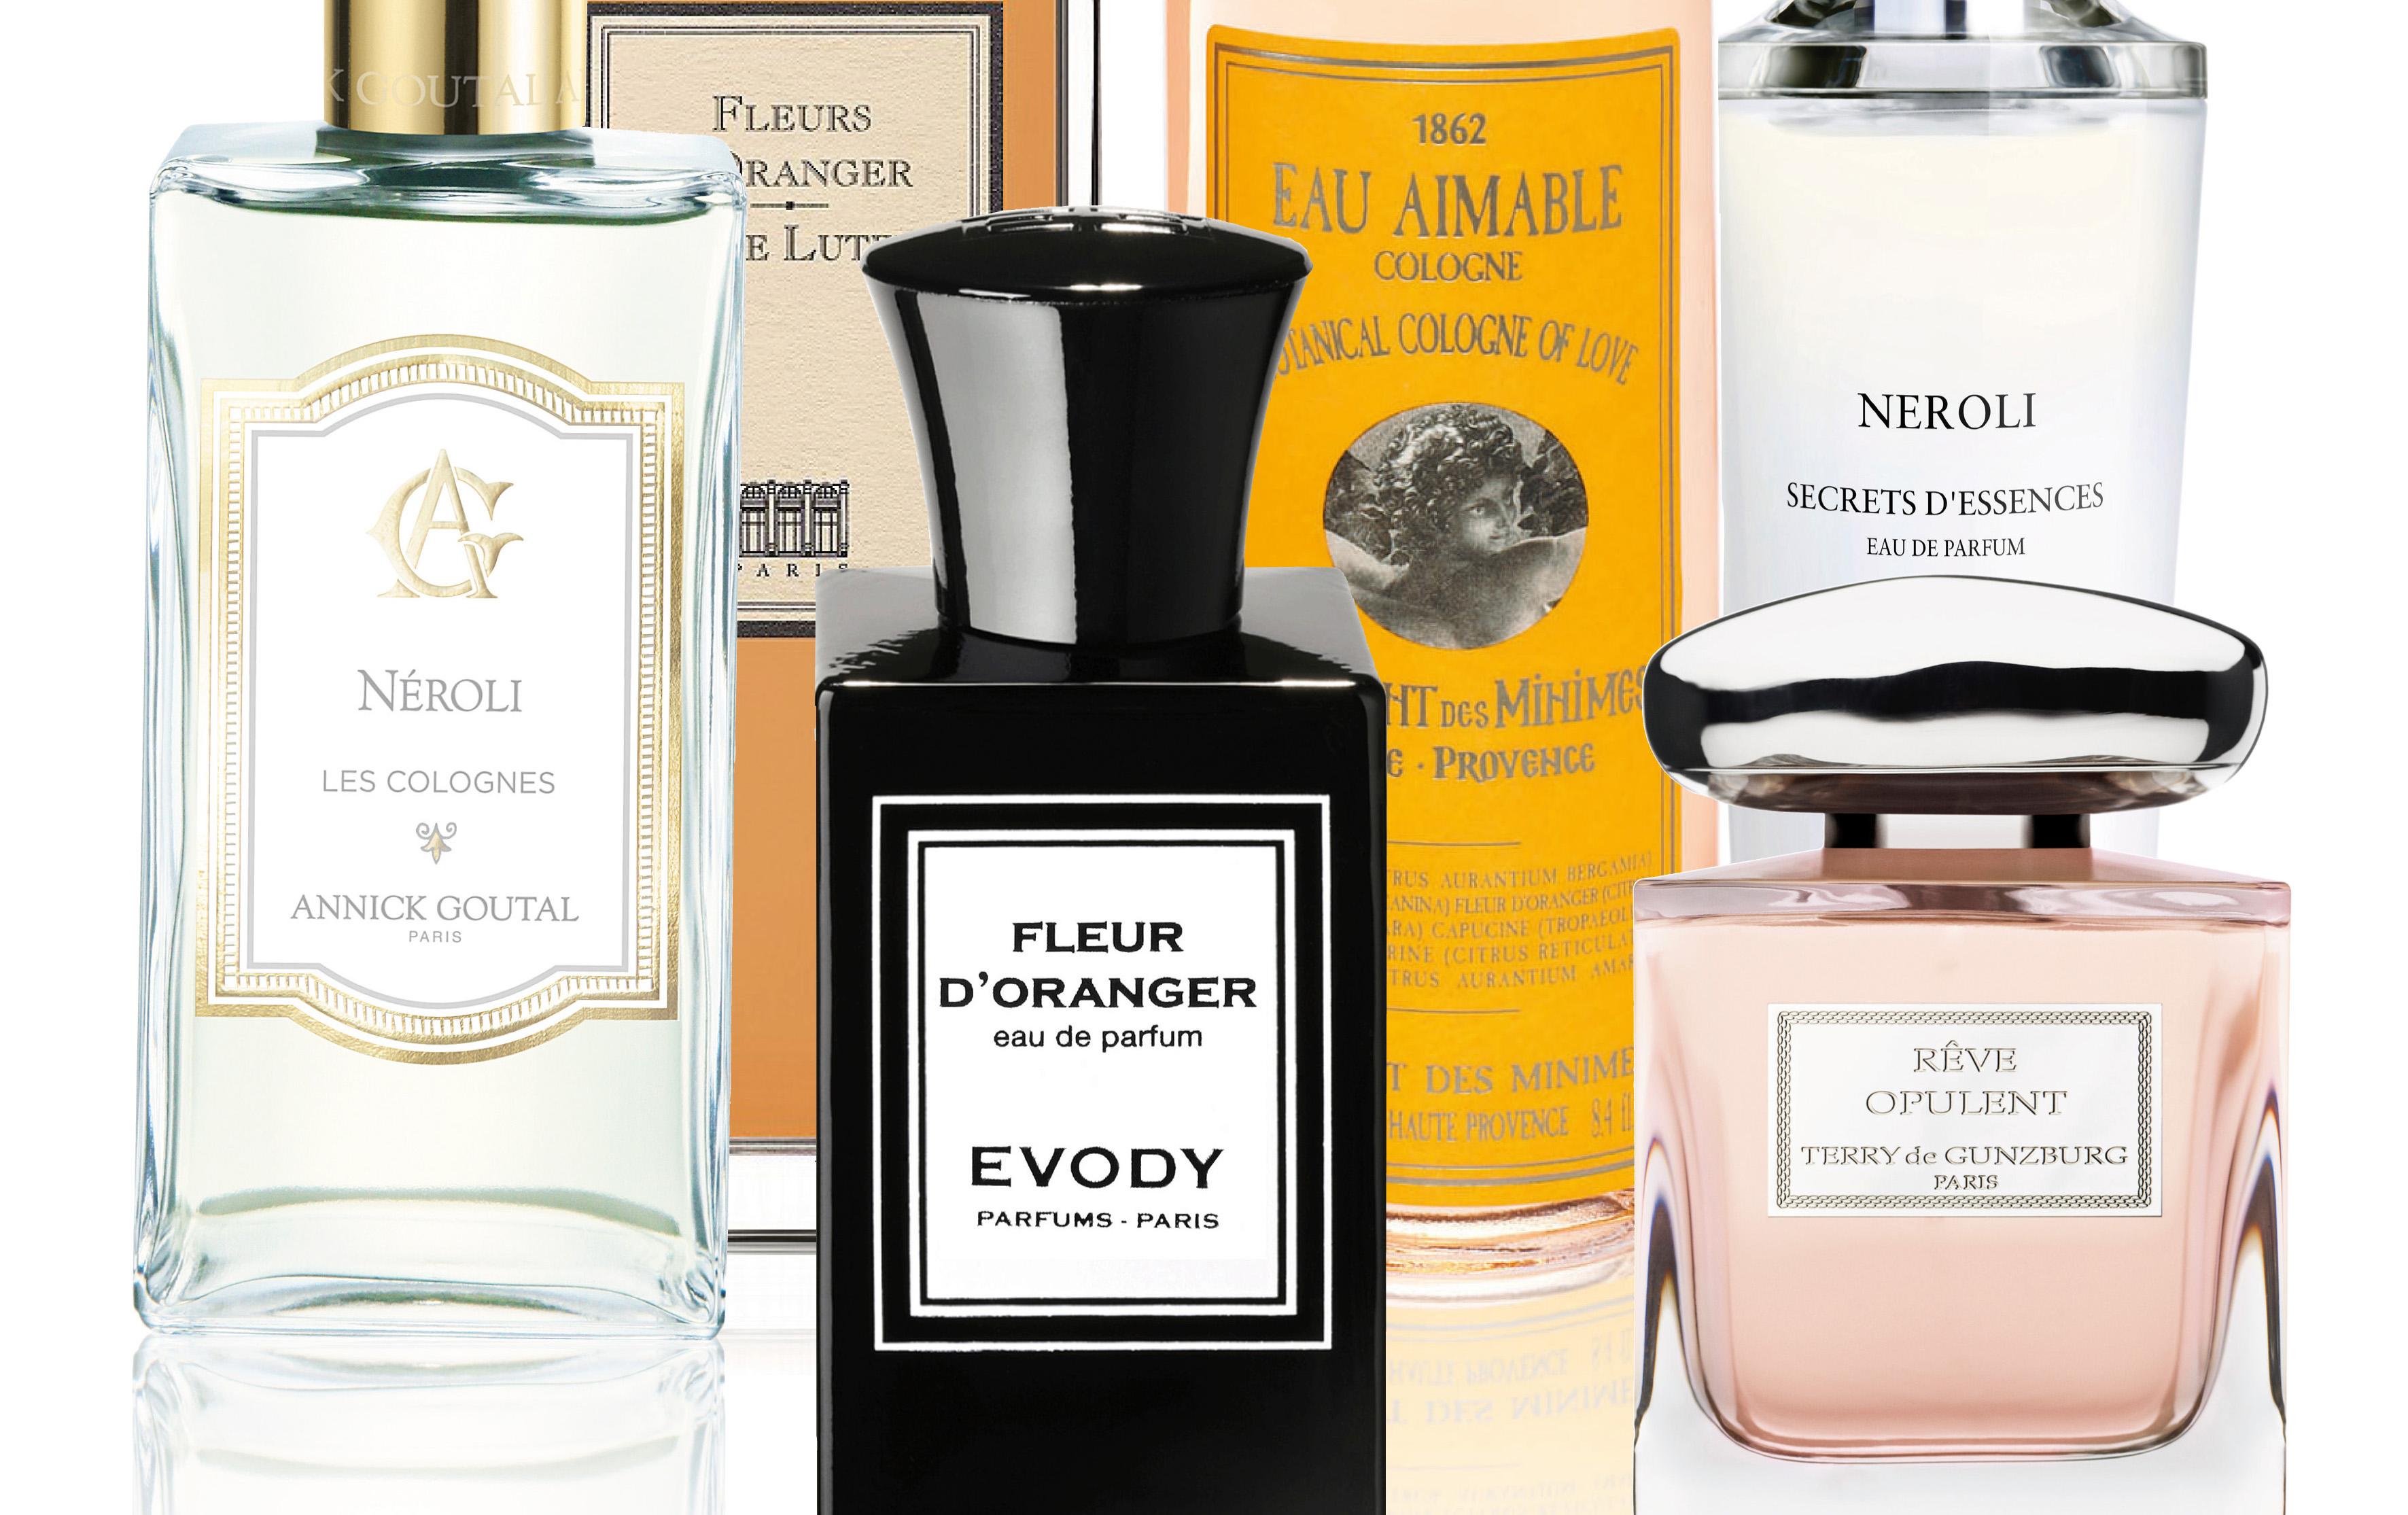 delices-parfums-fleur-oranger